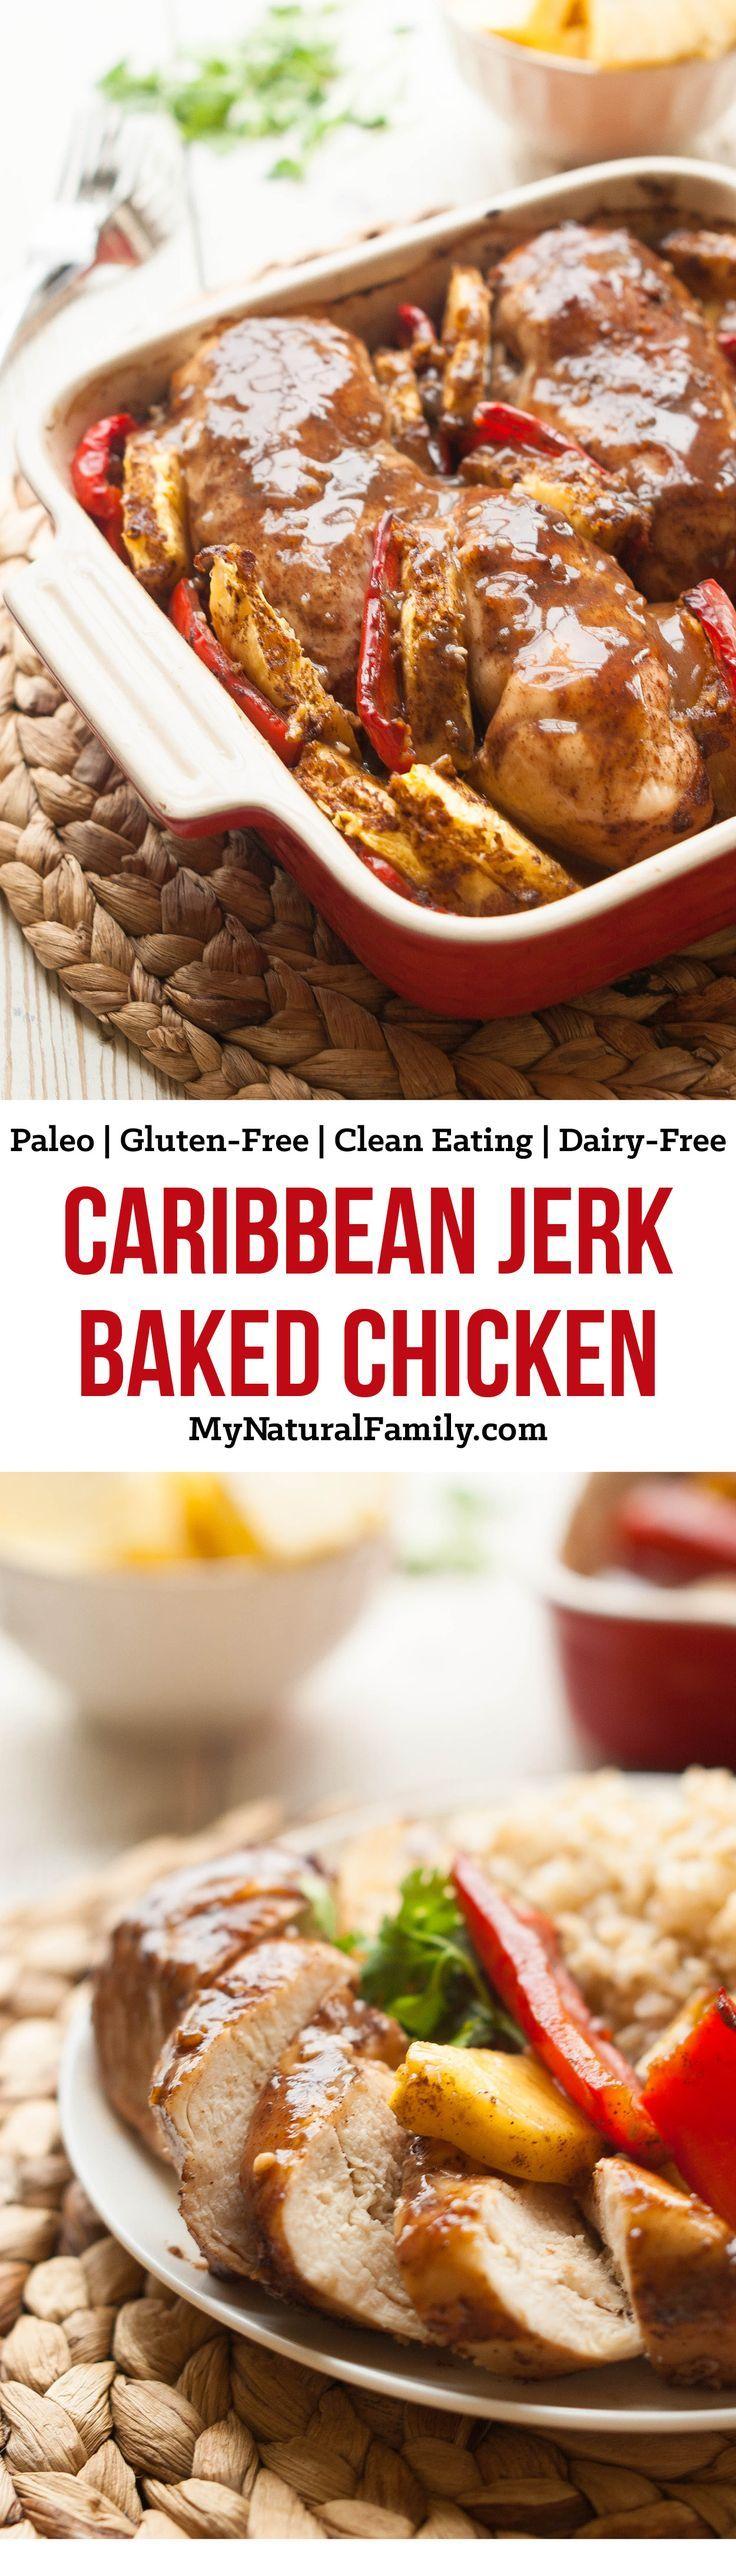 Caribbean Jerk Baked Chicken Recipe {Paleo, Gluten-Free, Clean Eating, Dairy-Free}